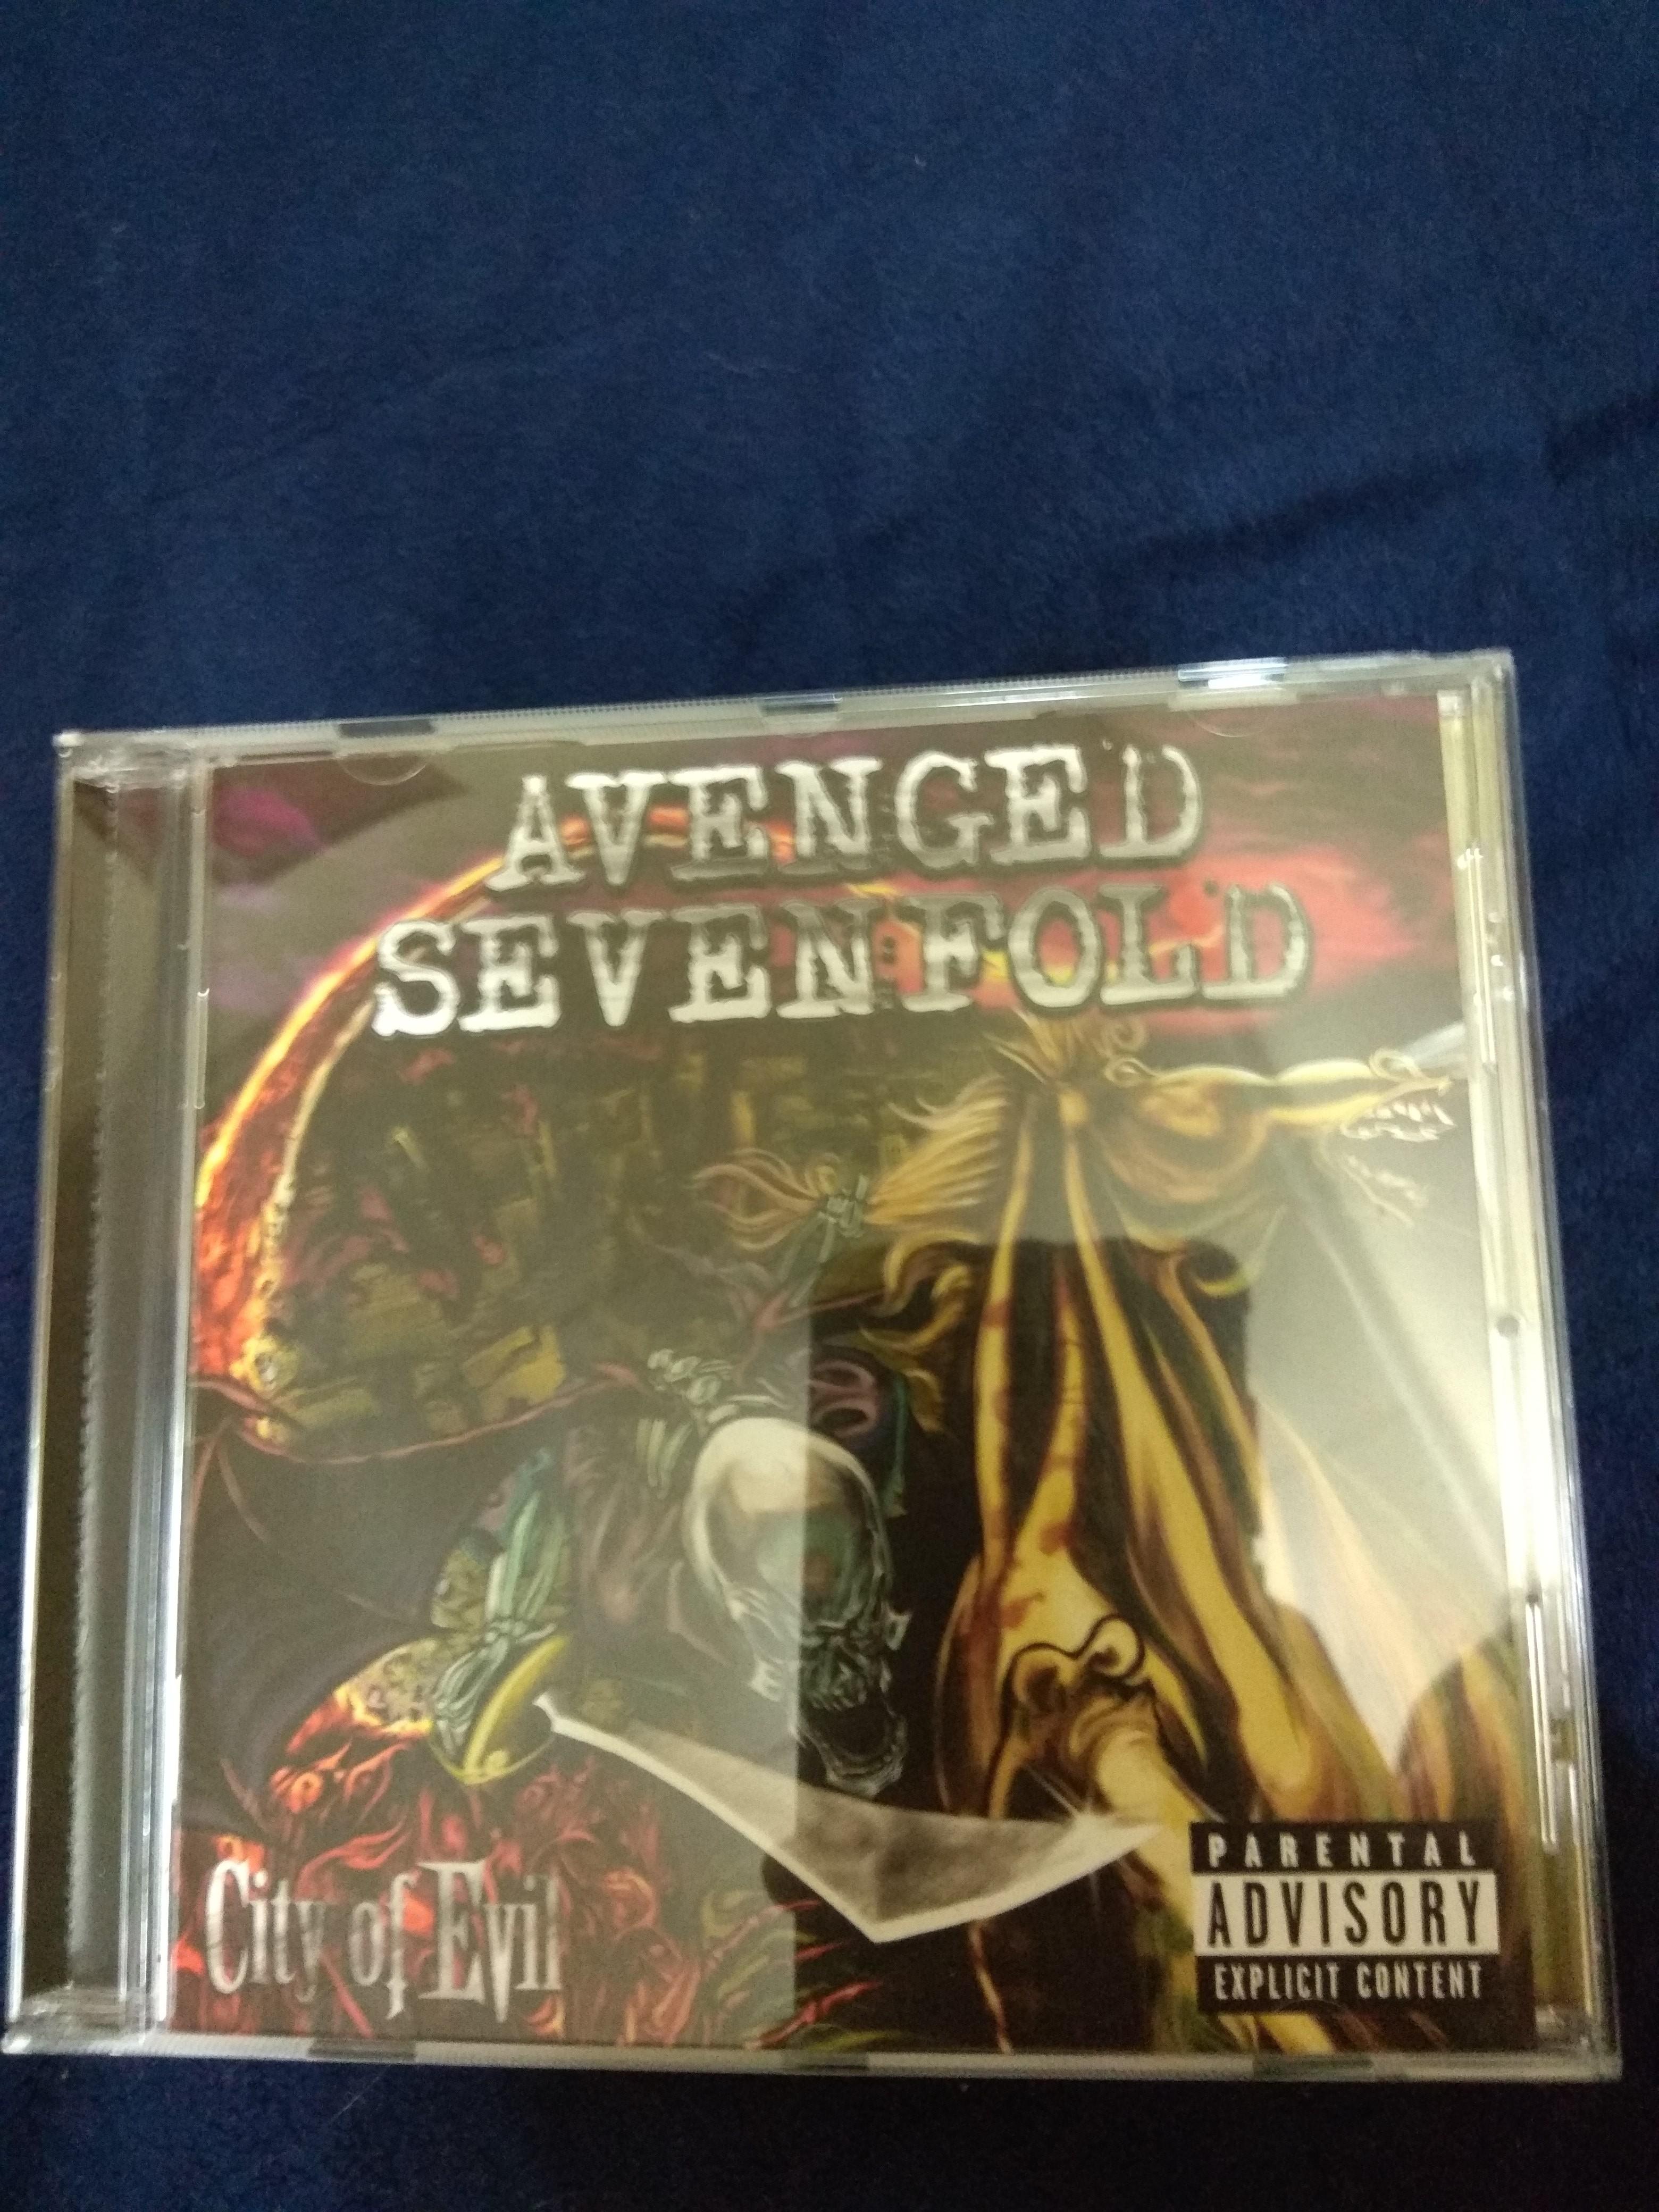 avenged sevenfold greatest hits cd